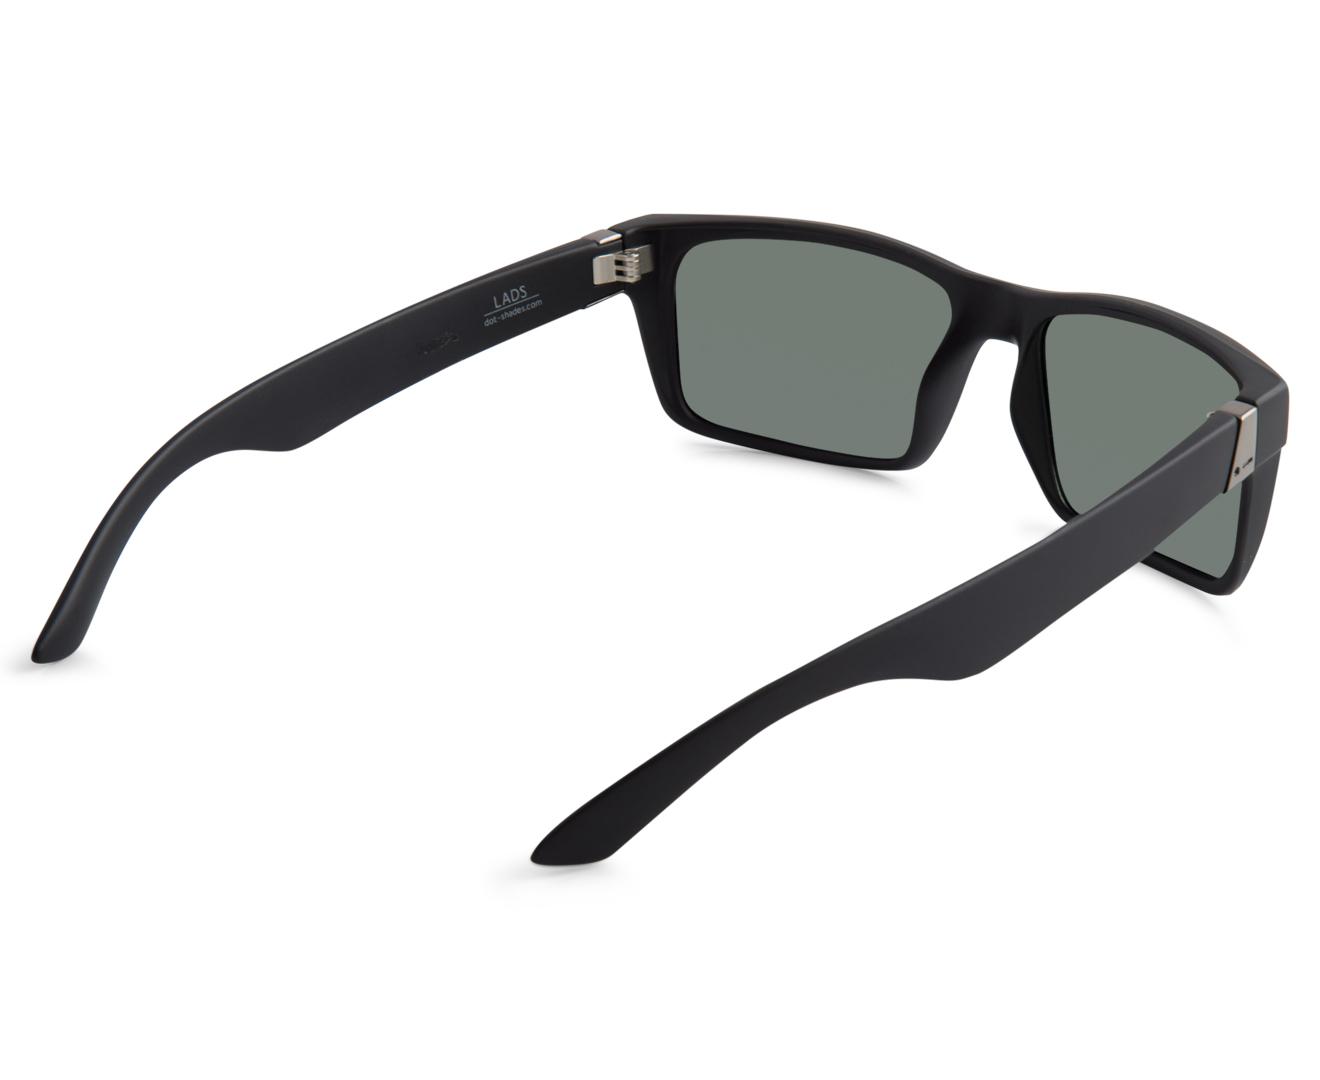 e870f9a7e33 Dot Dash Lads Sunglasses - Black Satin Grey